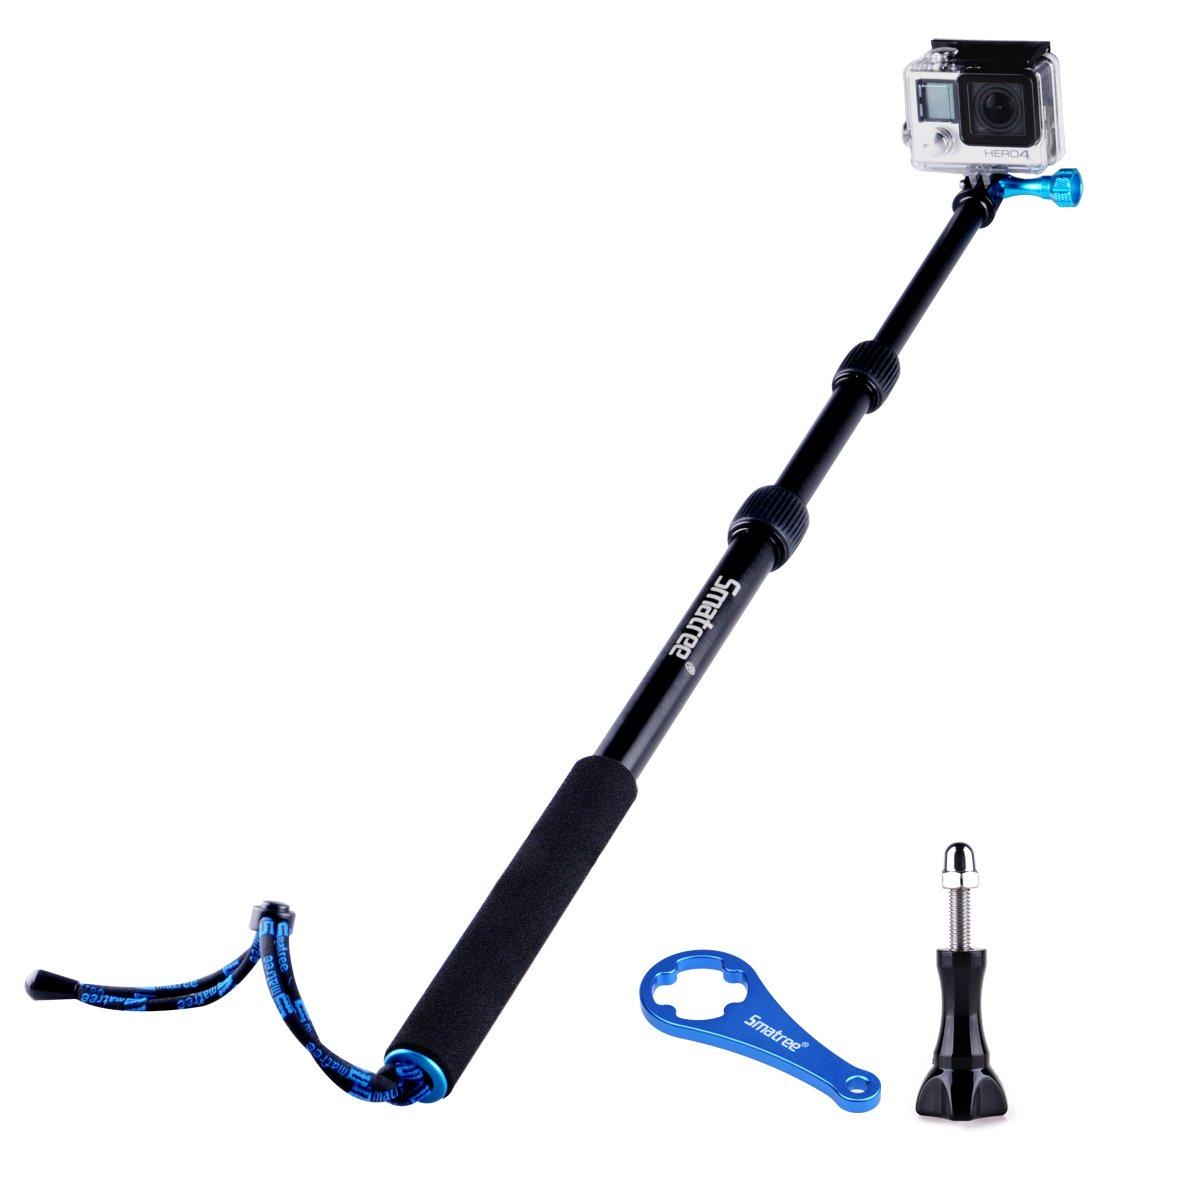 Smatree SmaPole S1 GoPro Handheld Pole